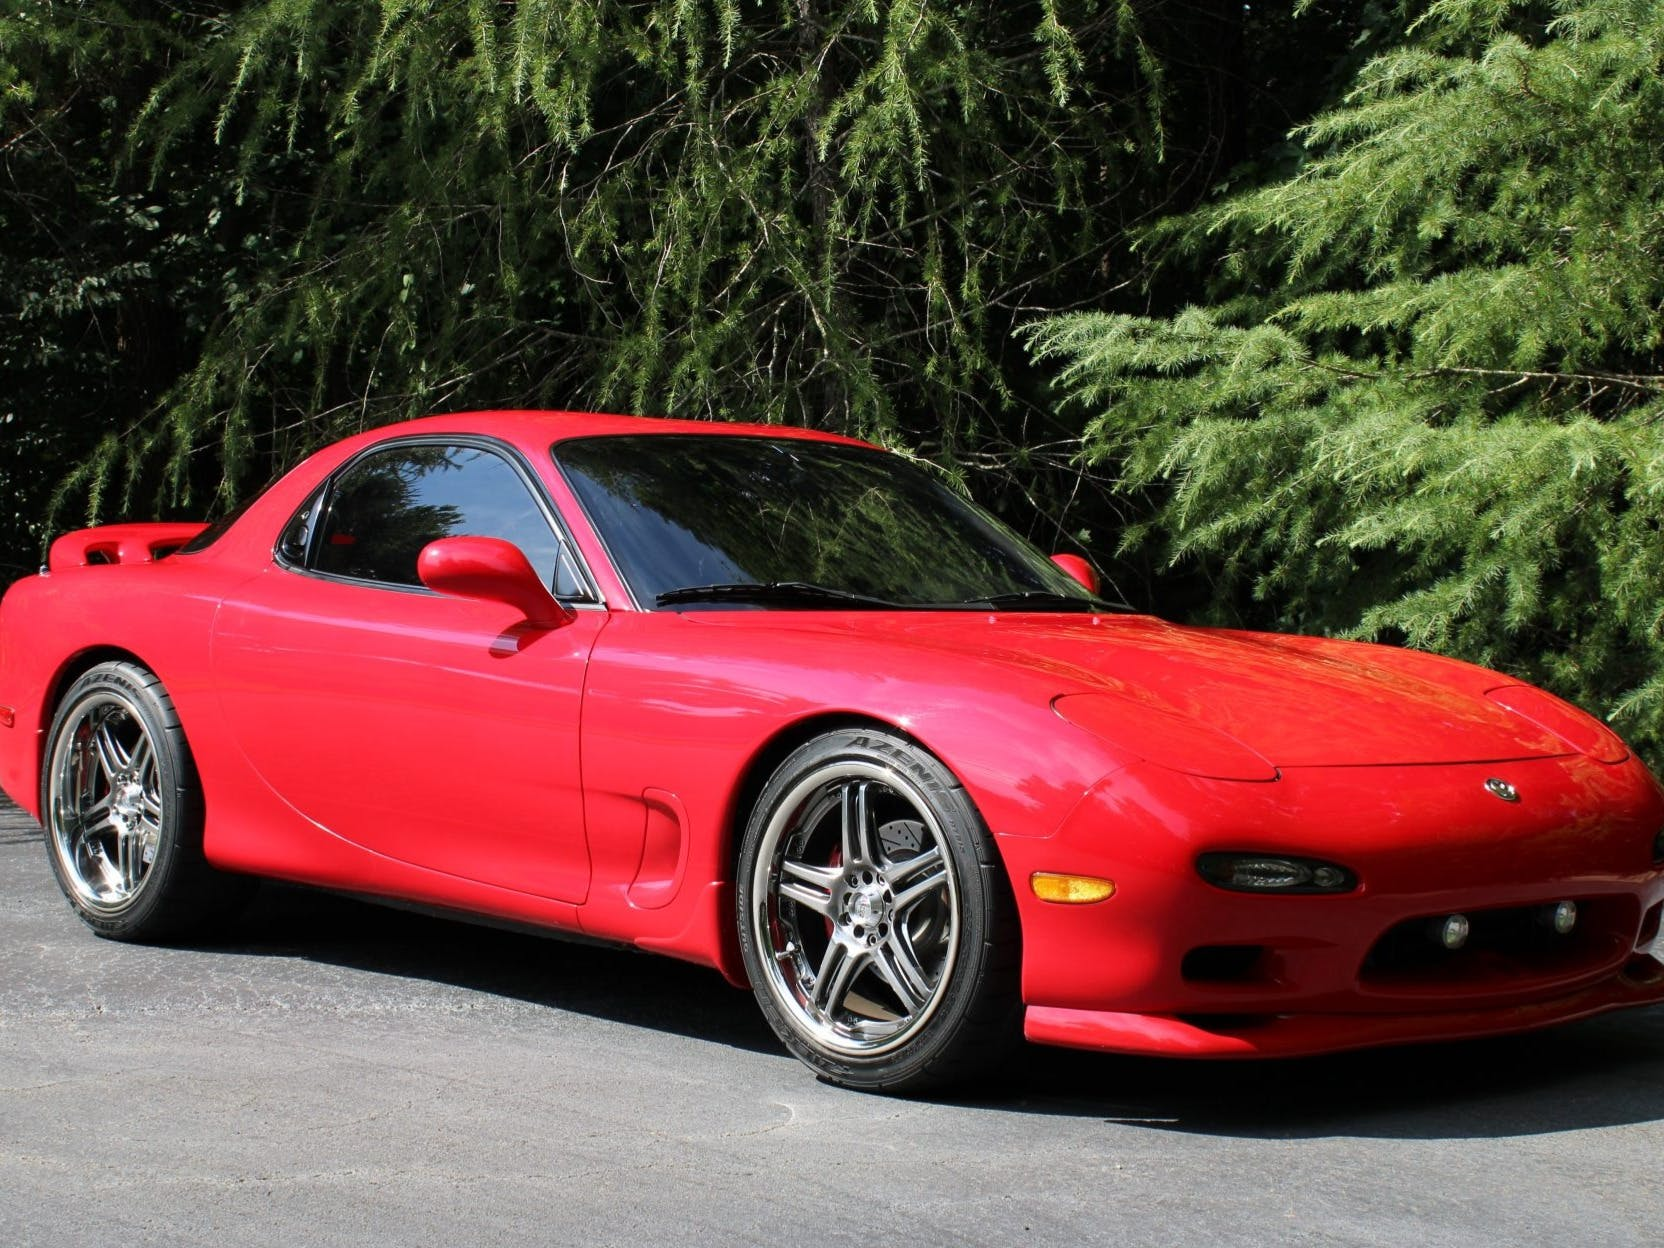 1993 Mazda RX-7 R1